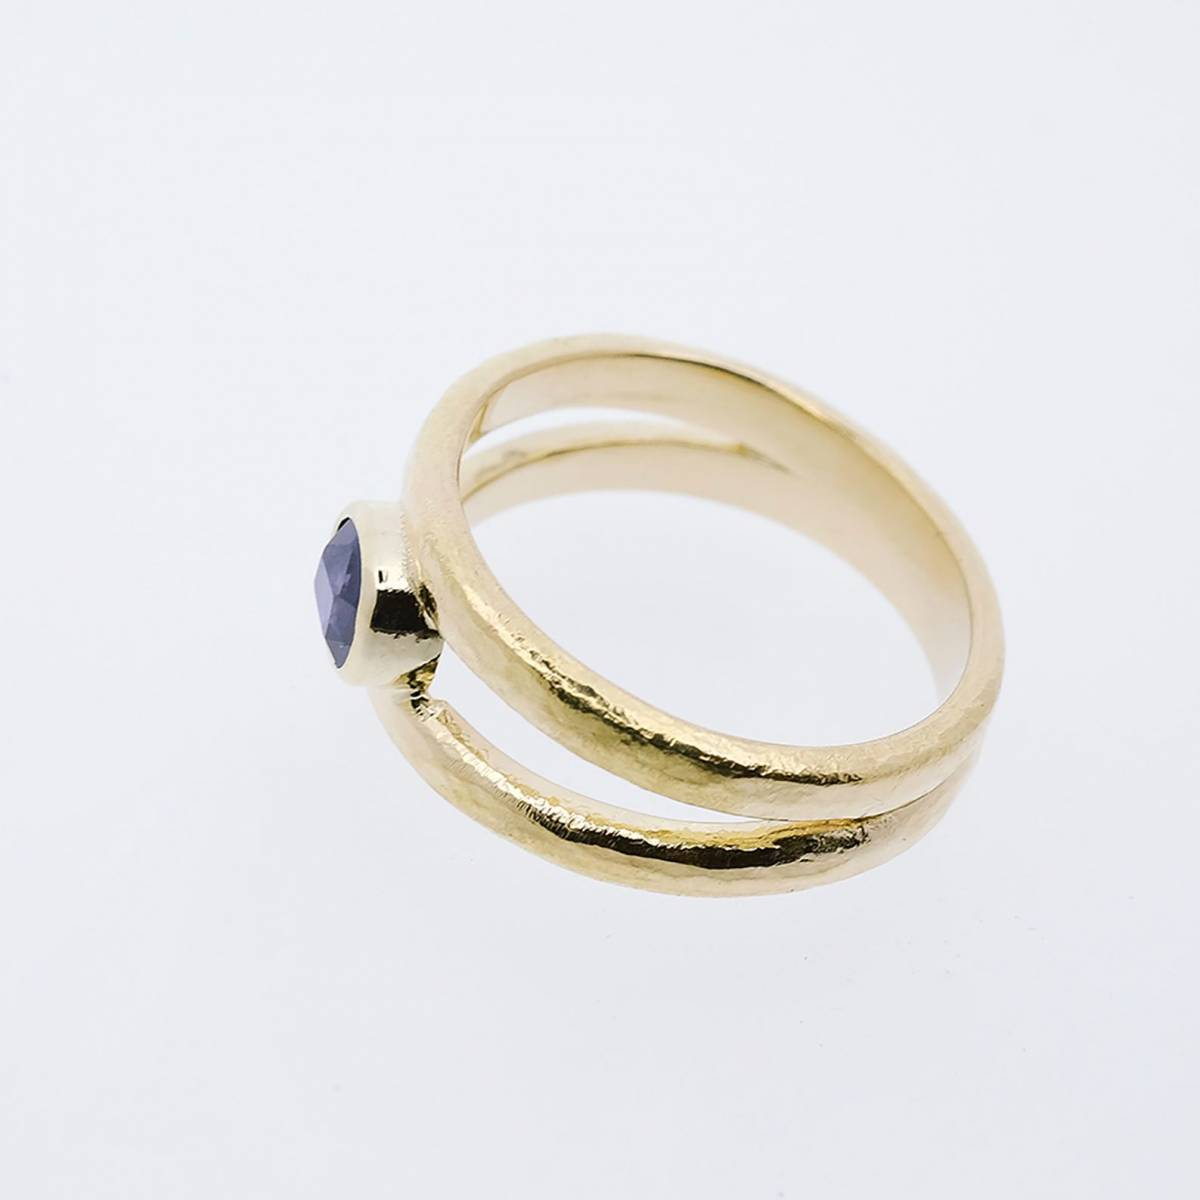 Jonas Maes Jewels - Juwelen - Bruidsjuwelen - Verlovingsring - Trouwring - House of Weddings - 15